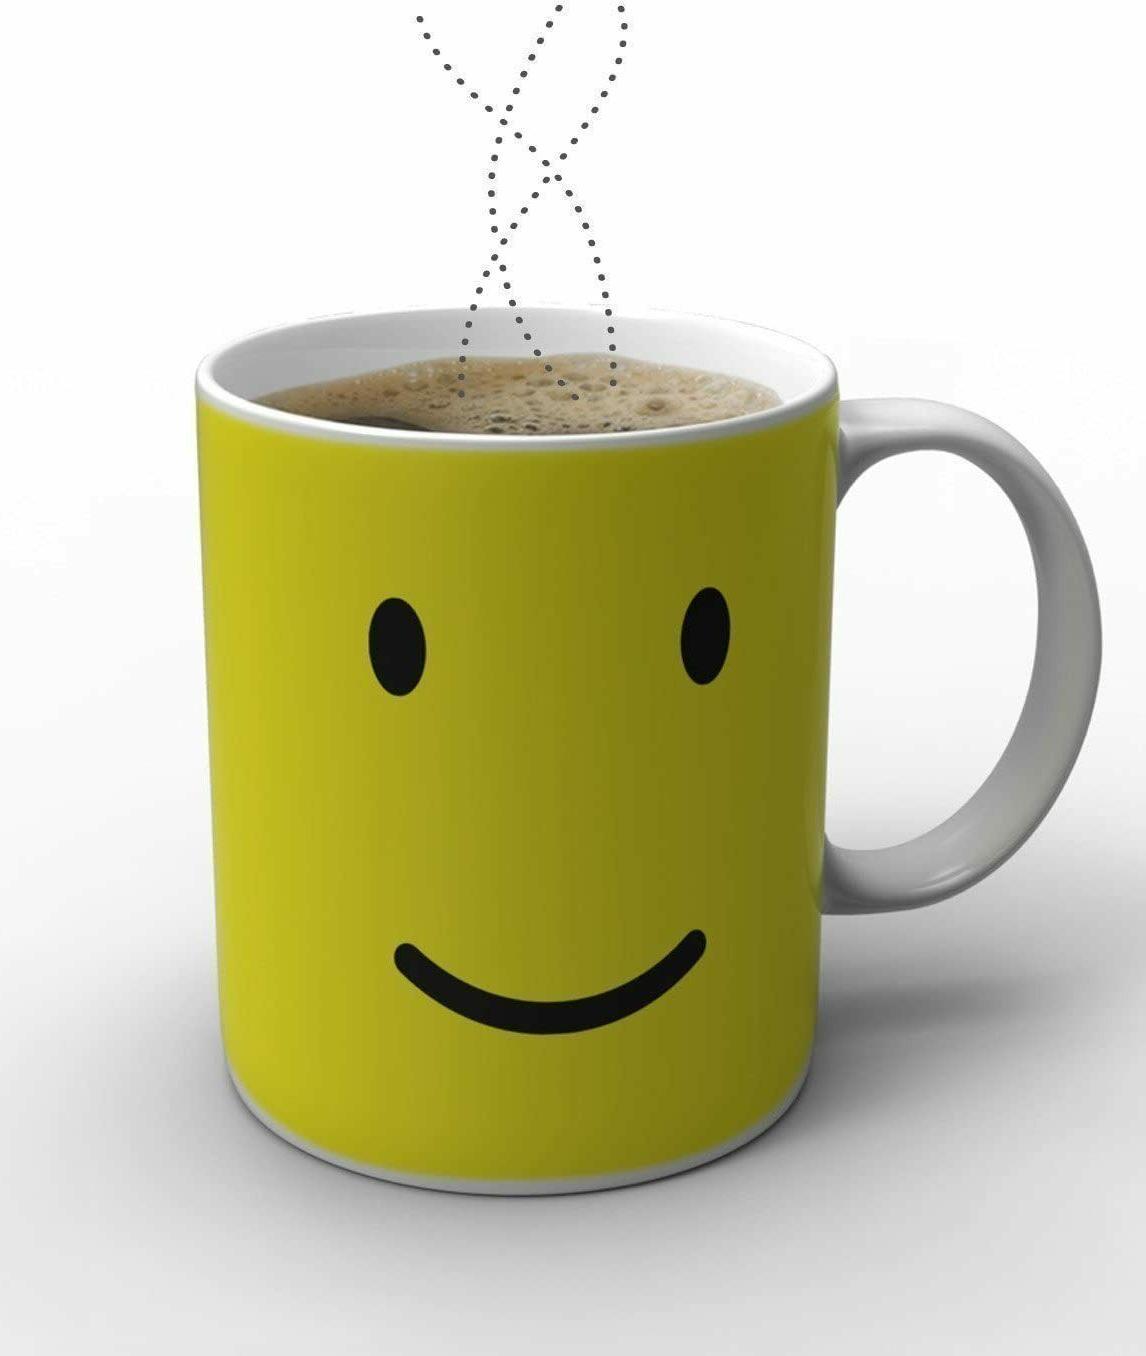 Magic Heat Sensitive Porcelain Tea